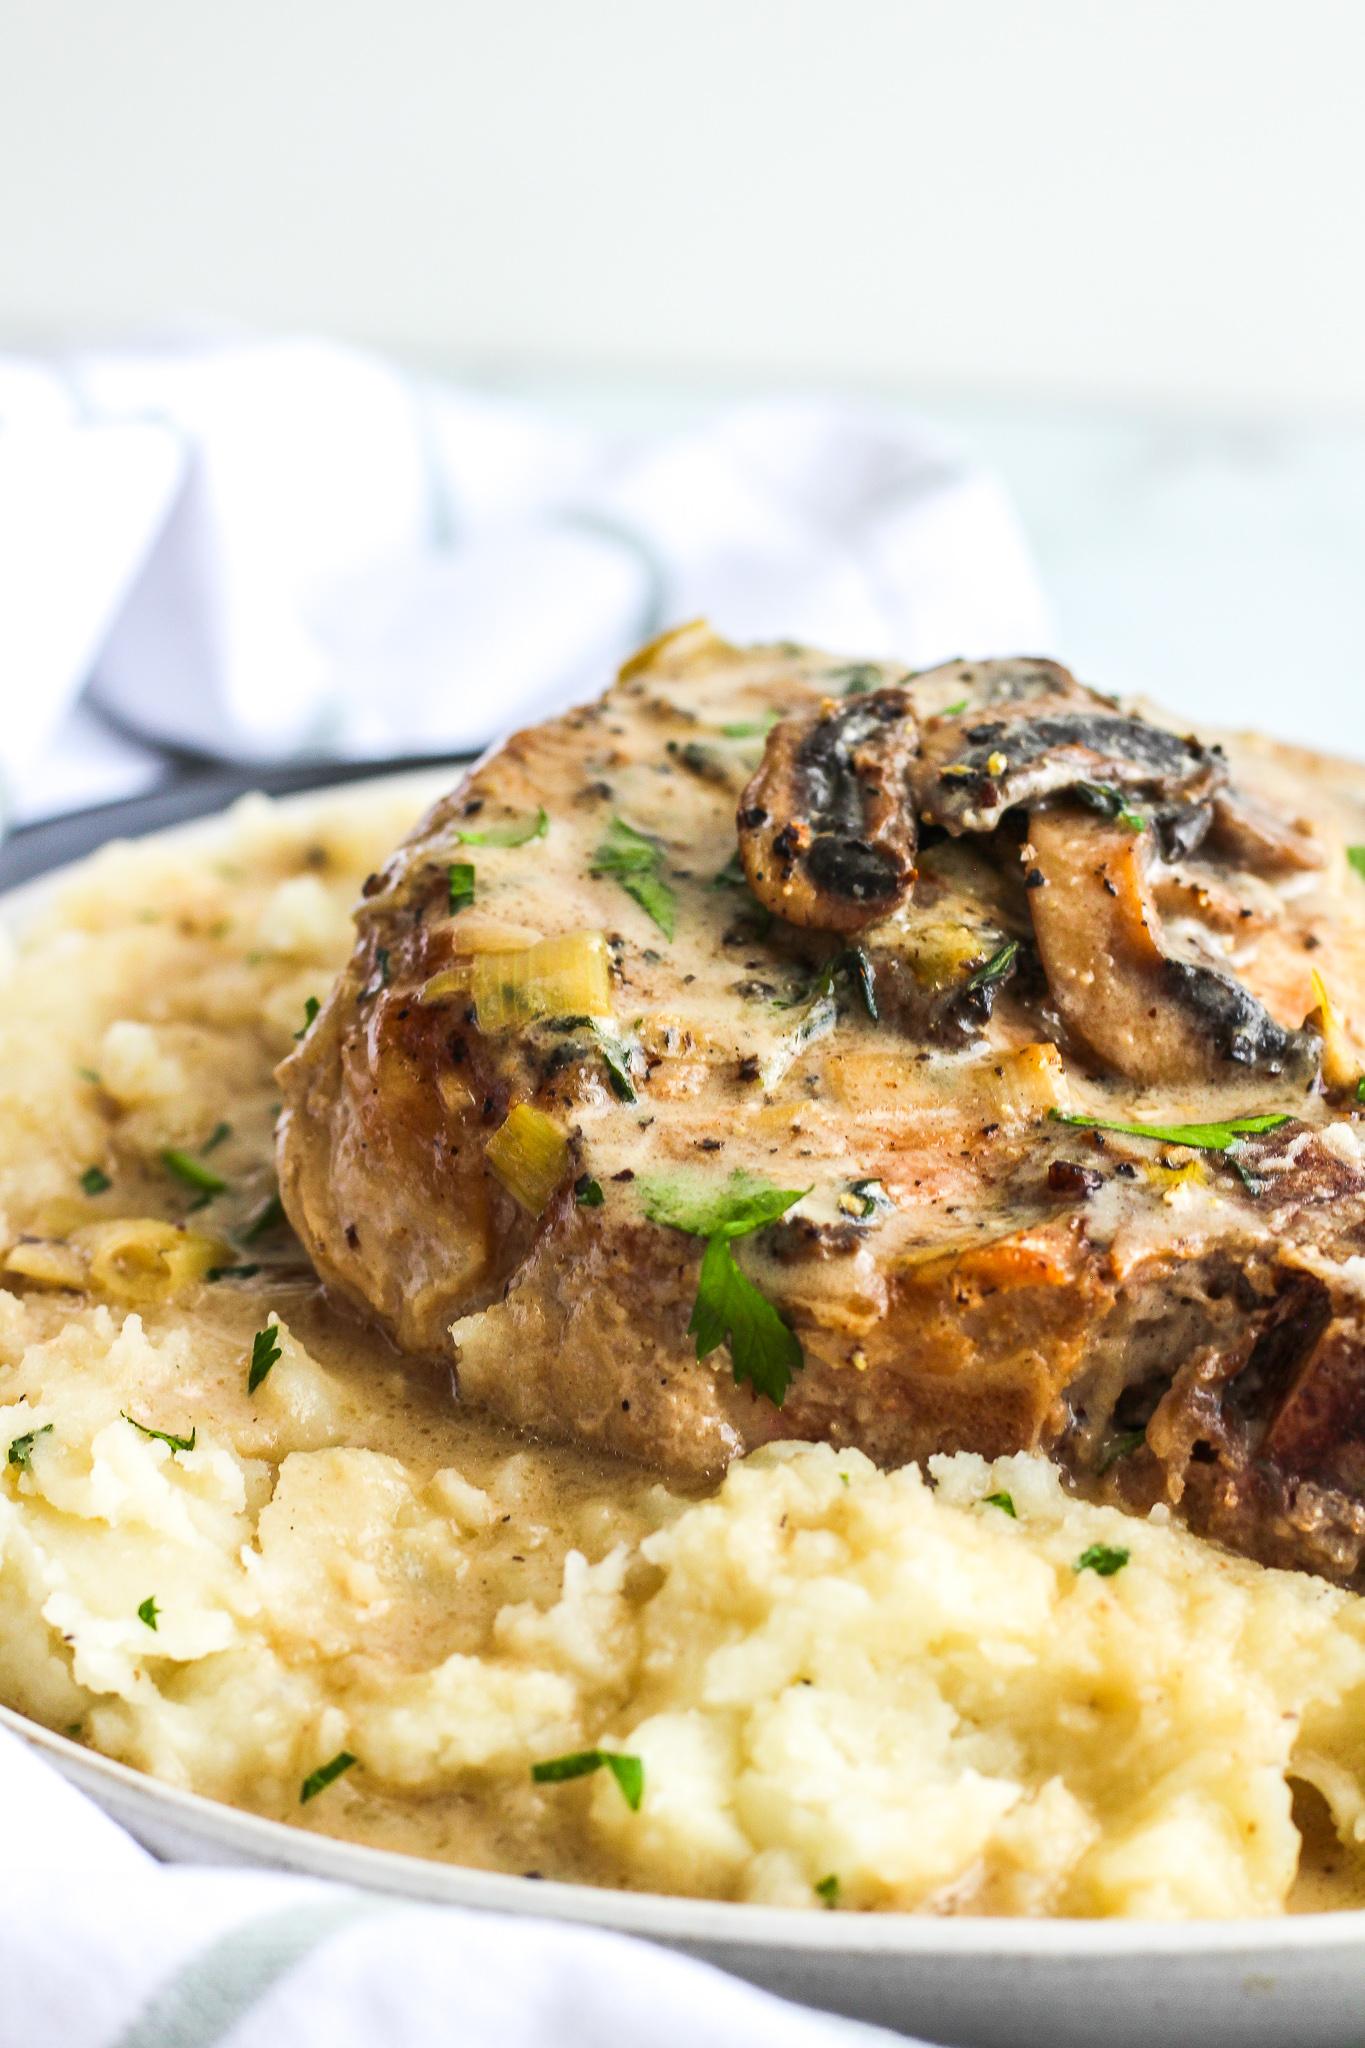 Pork Chops with Mushroom & Leek Cream Sauce